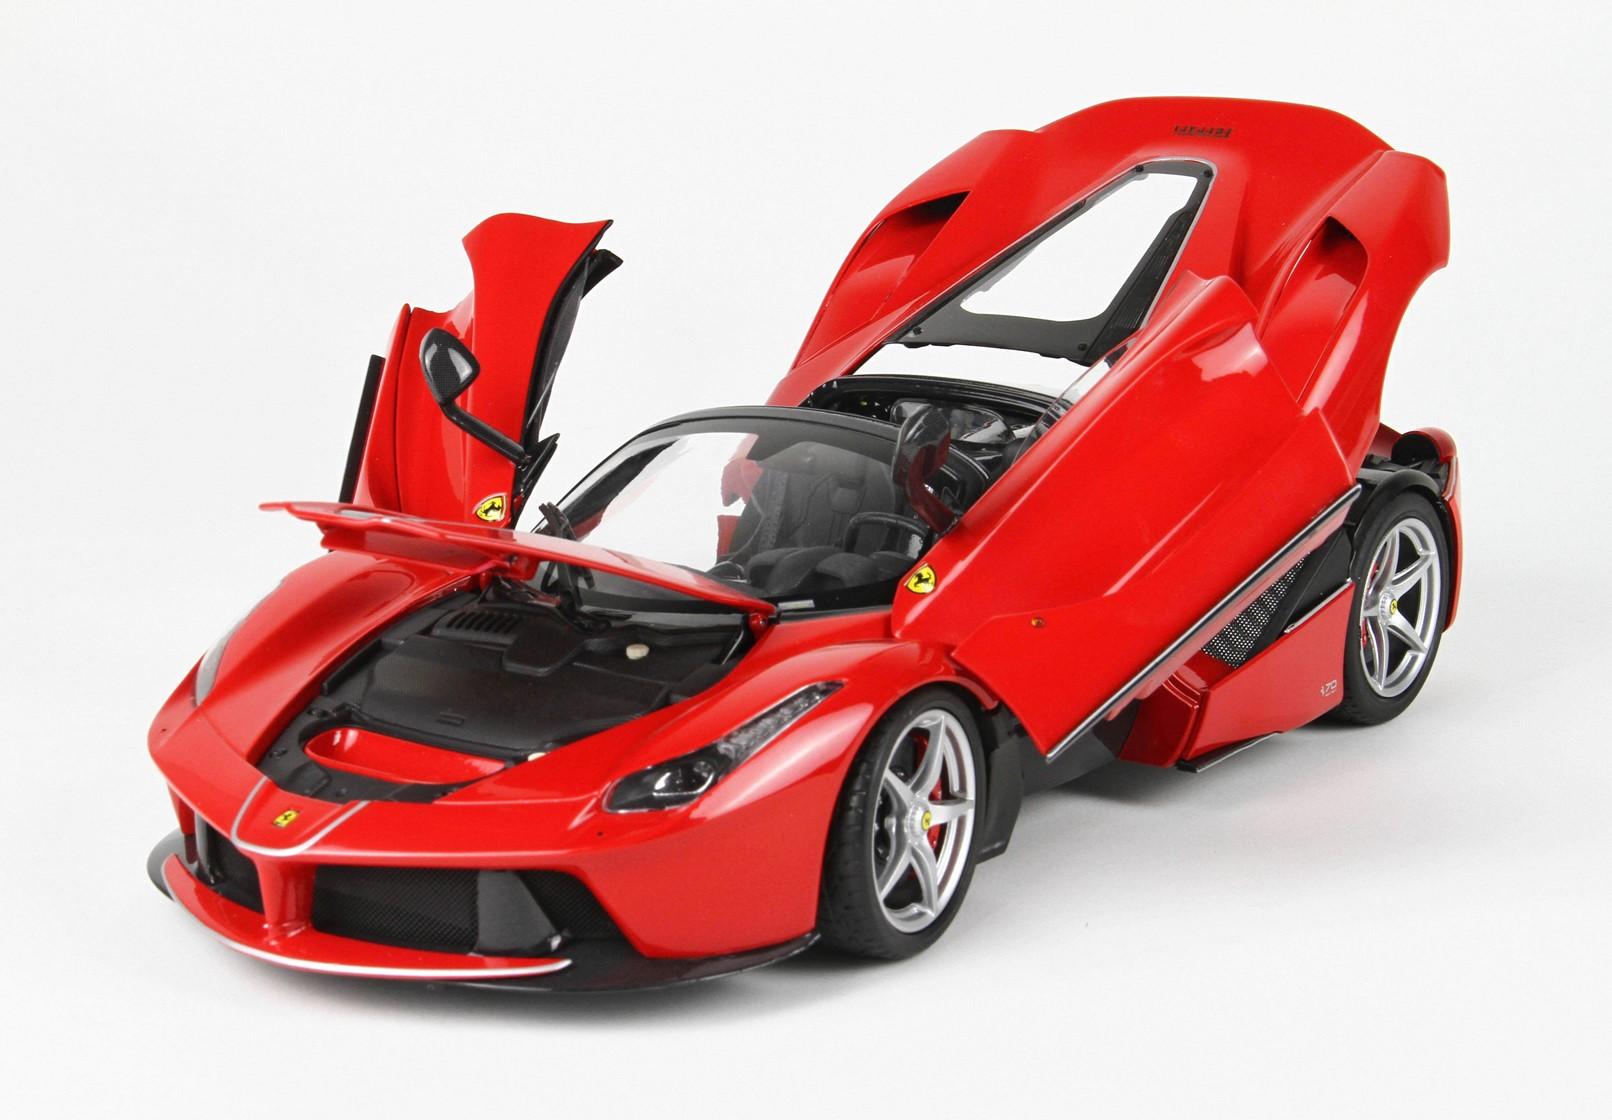 Bbr Ferrari Laferrari Aperta Rosso Corsa 322 Hansecars Modellautos Hansecars Exklusive Sammlermodelle